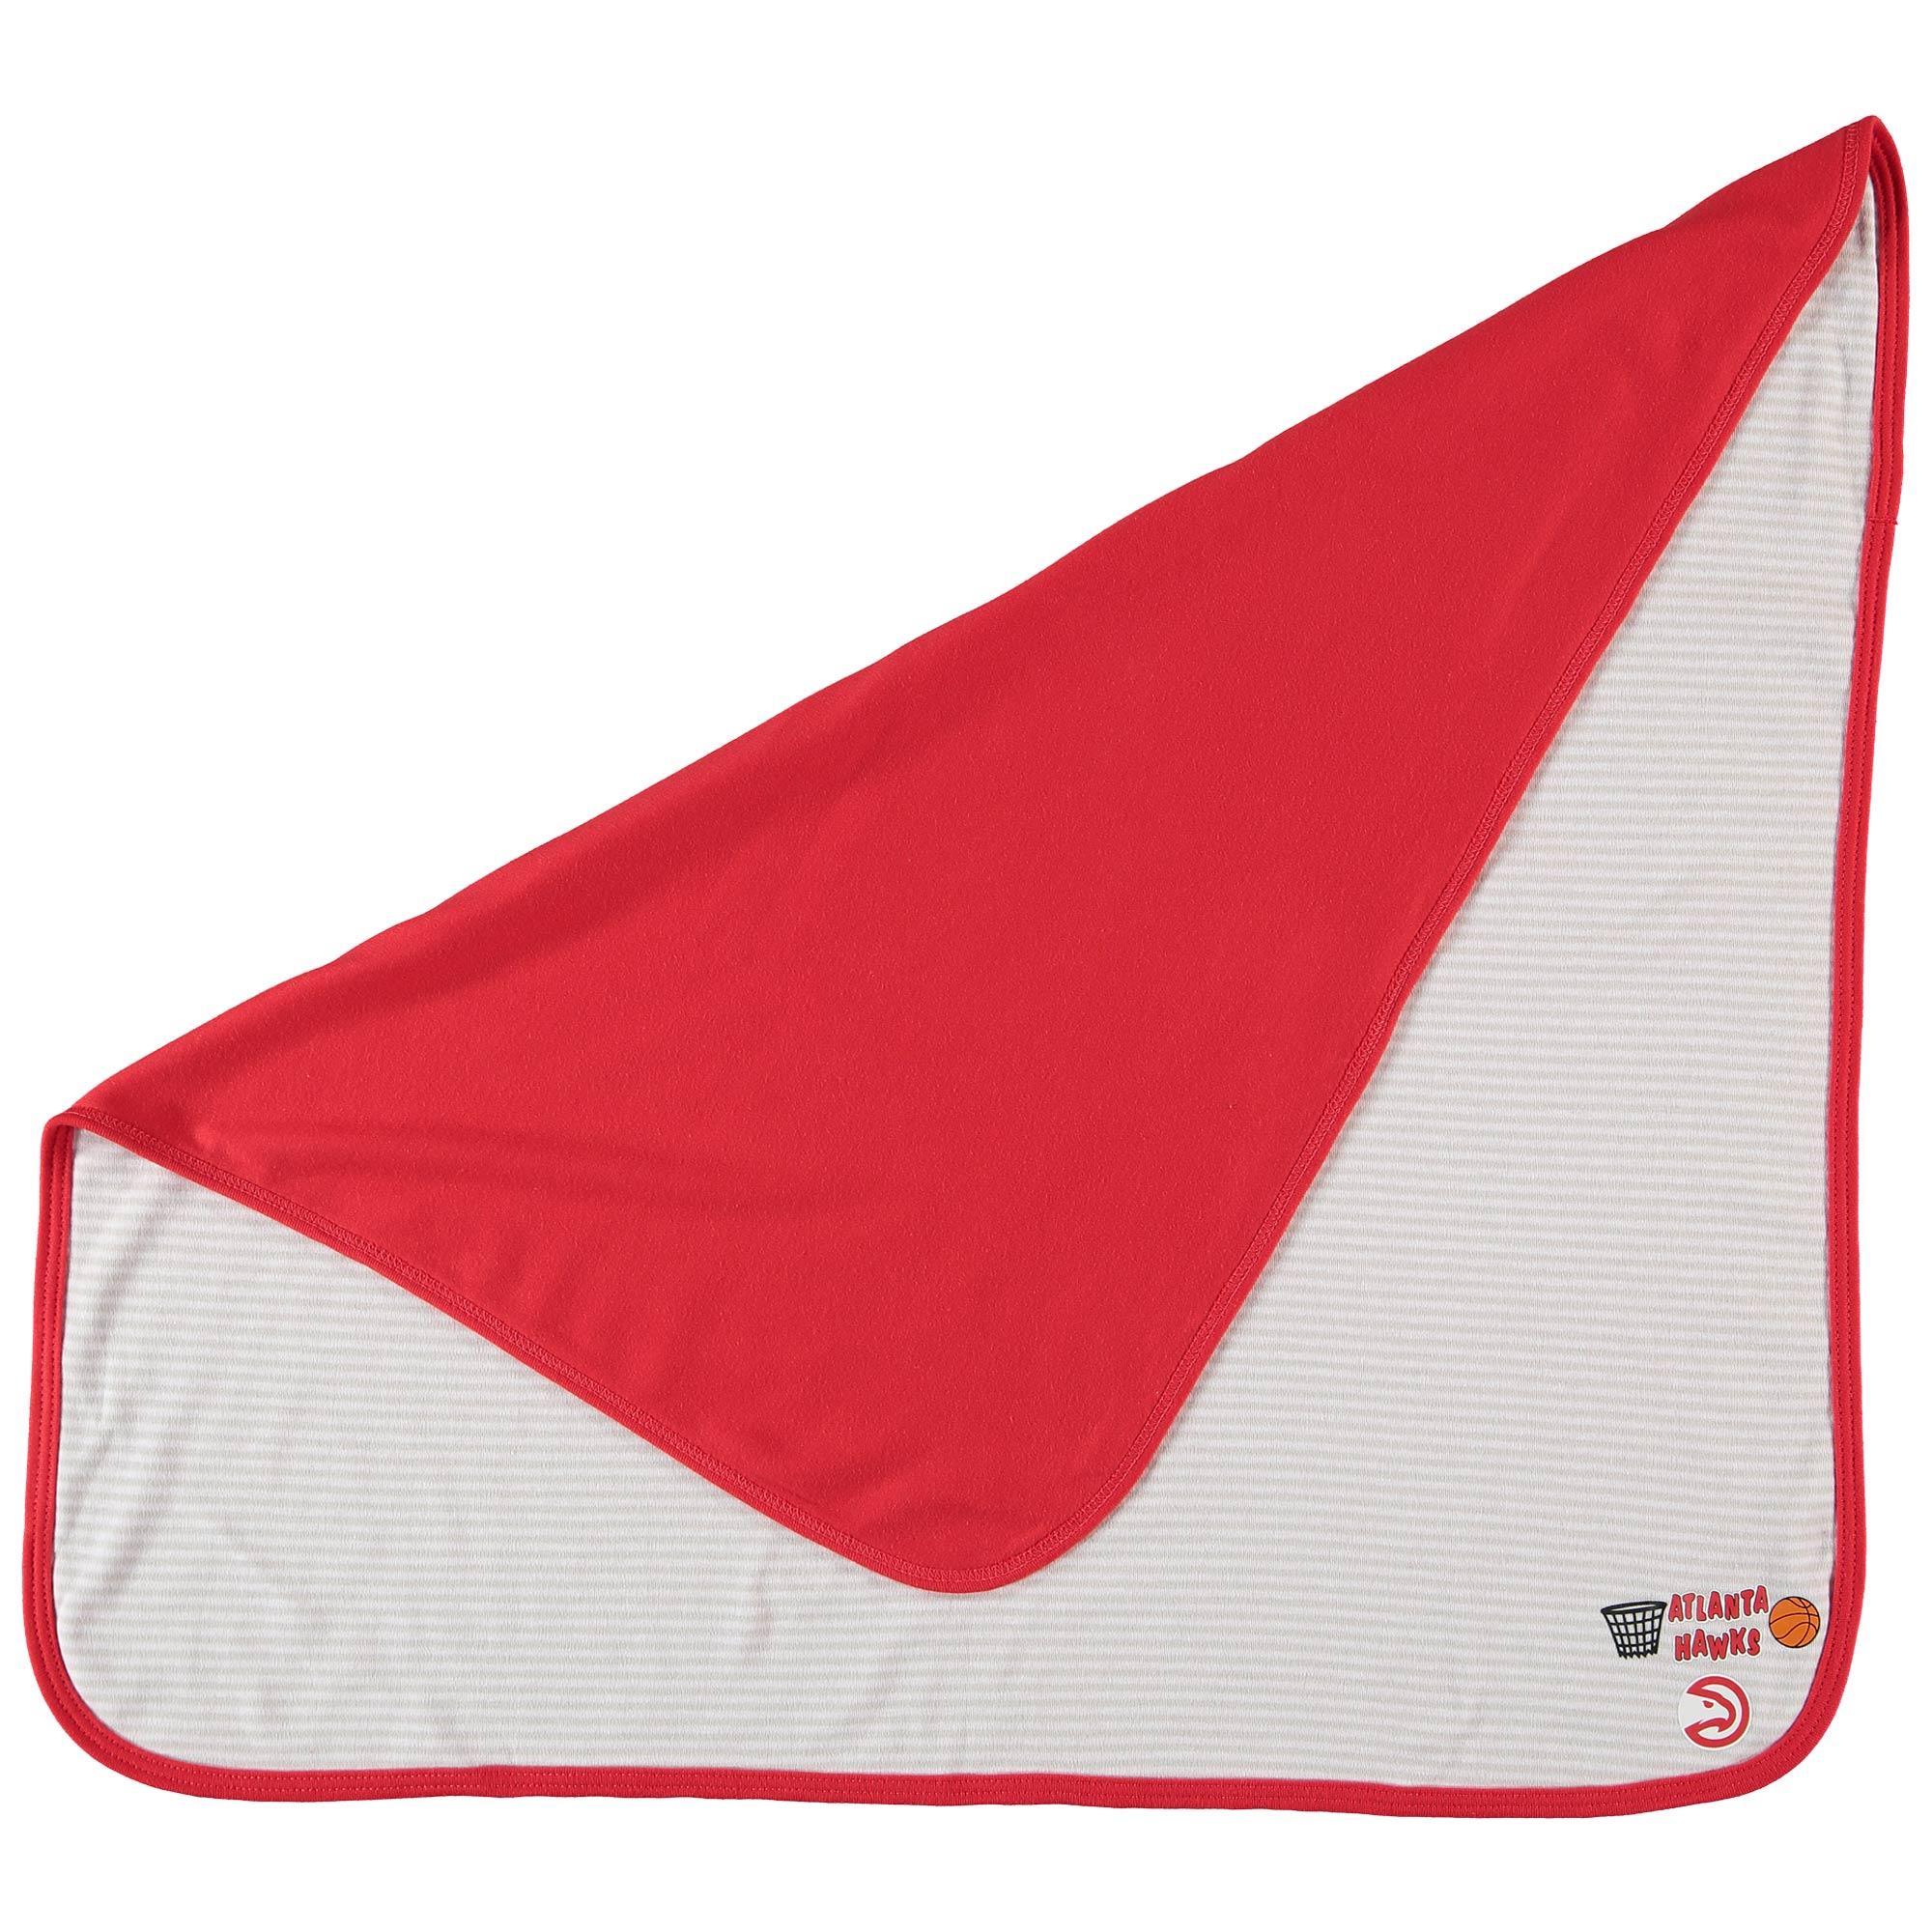 Atlanta Hawks Infant Lil Kicker Baby Blanket - Red - No Size